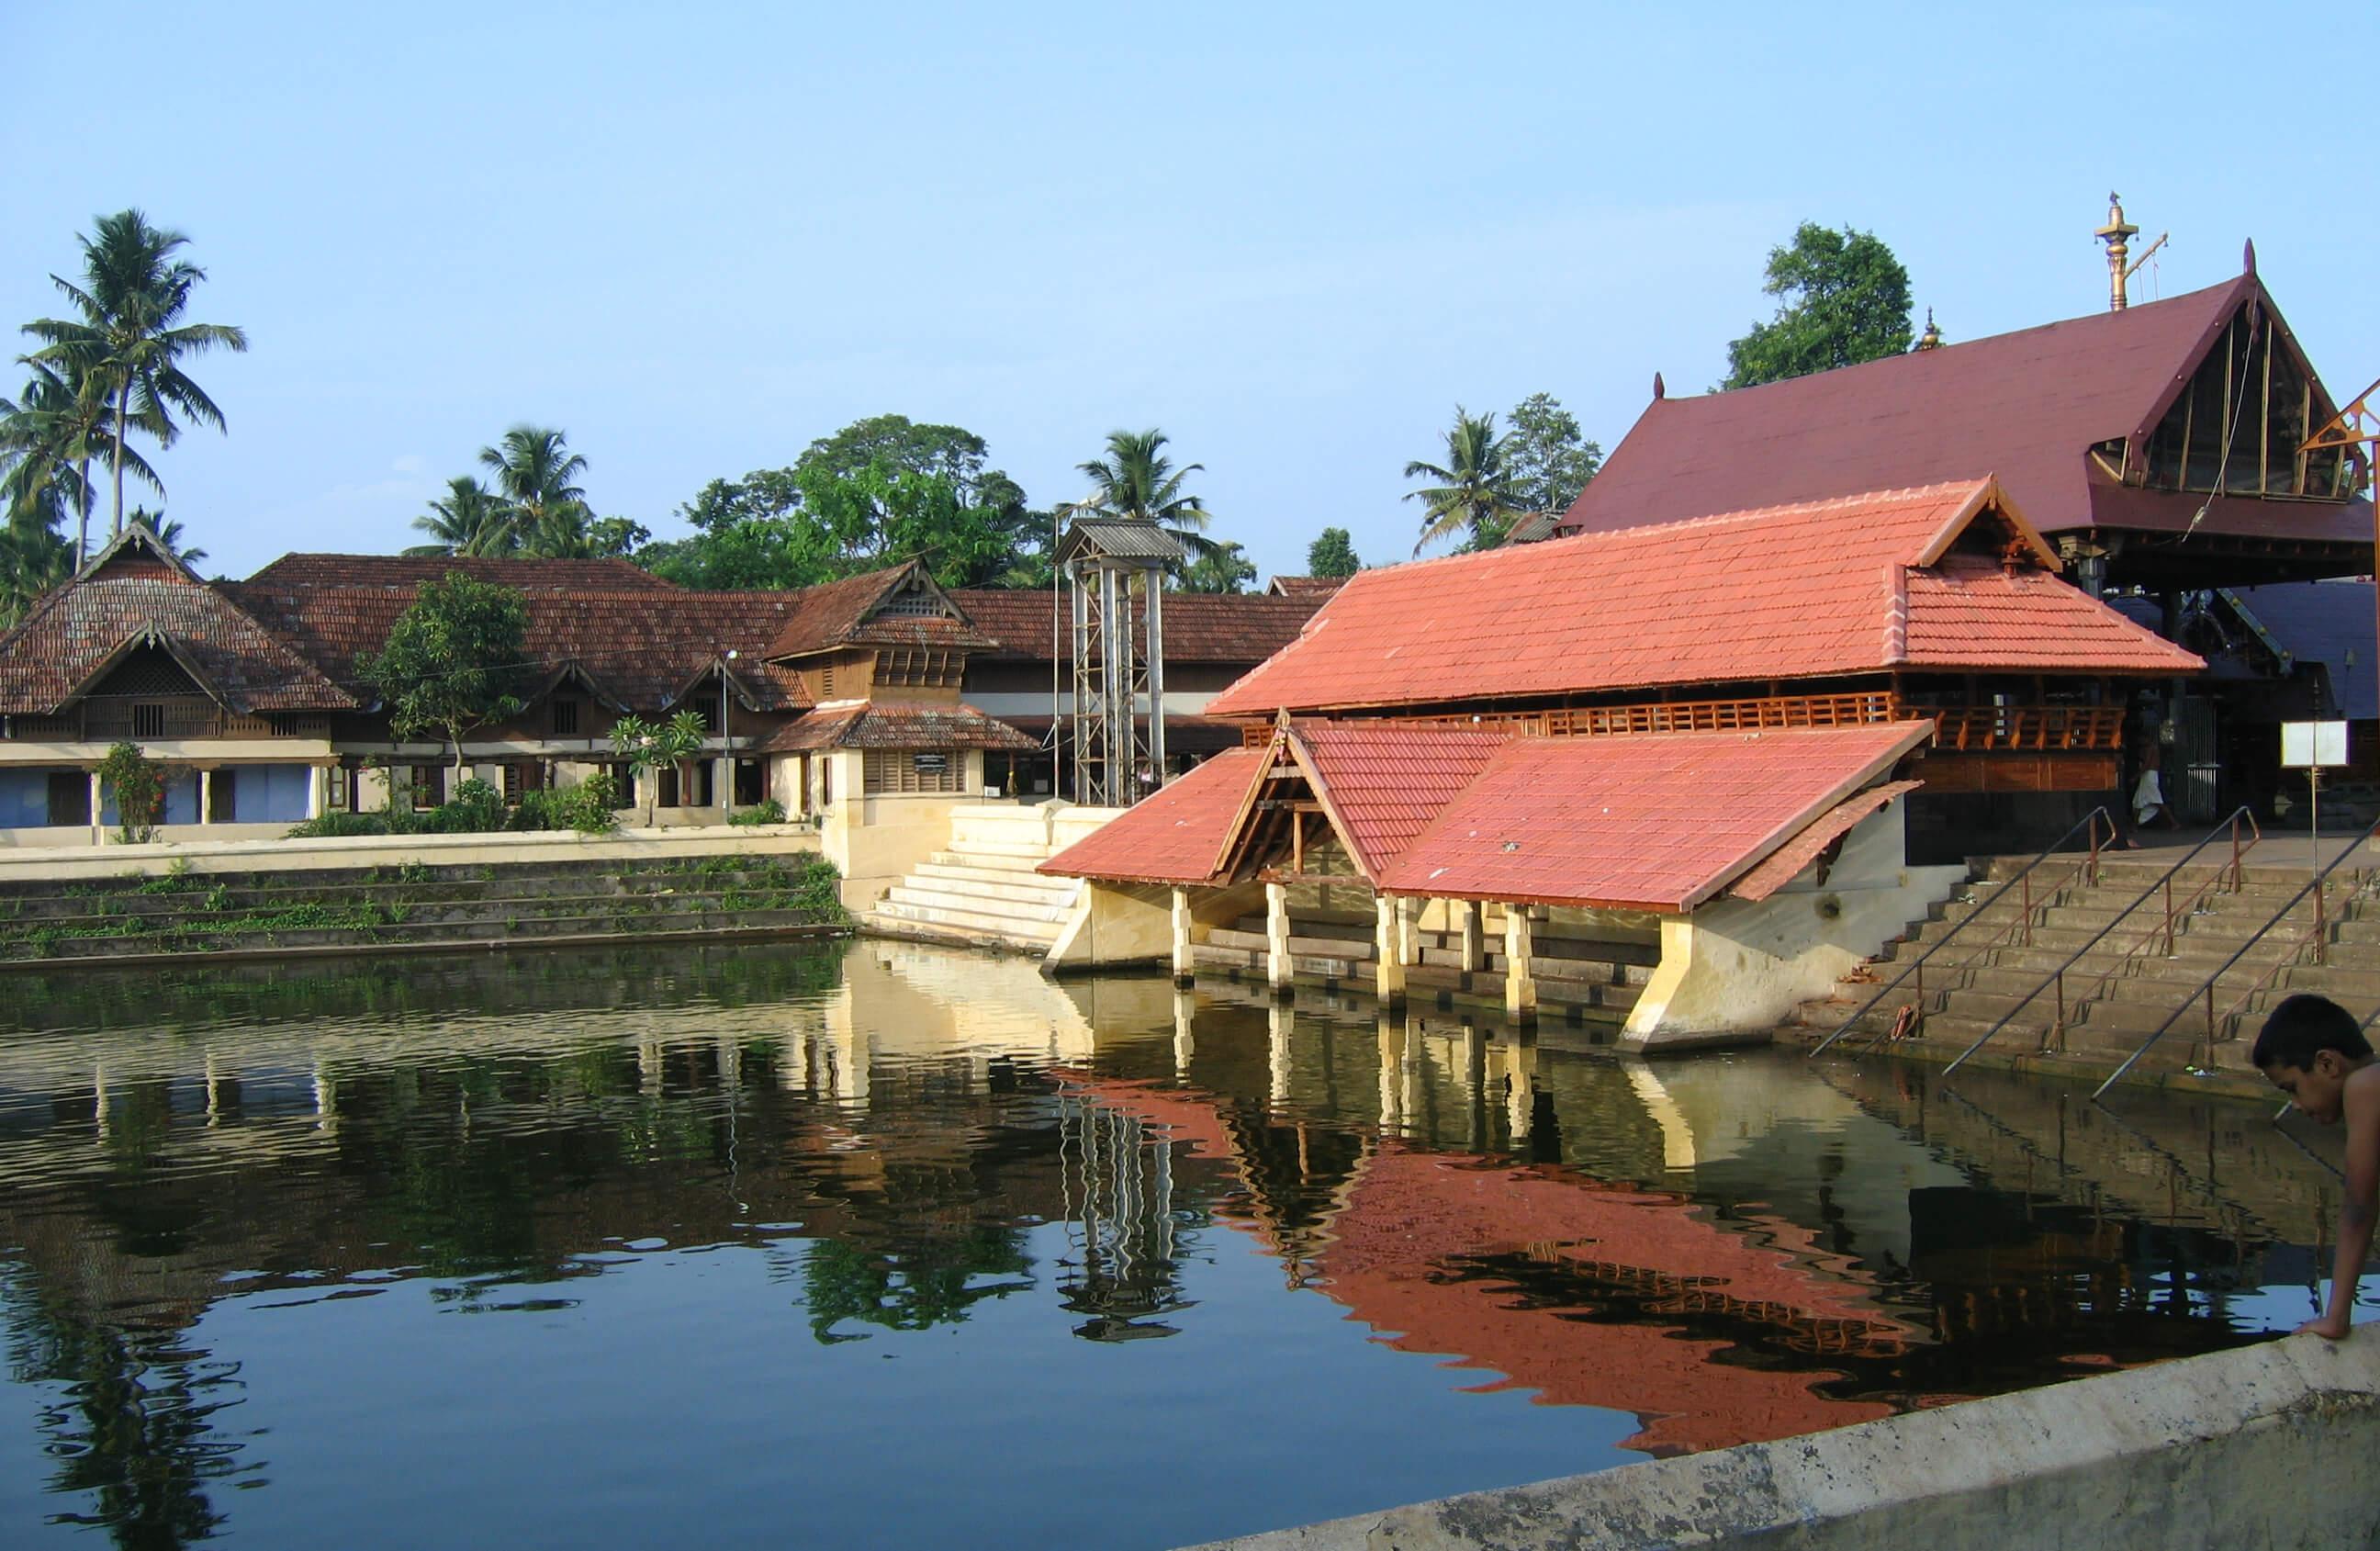 Ambalapuzha Srikrishna Temple